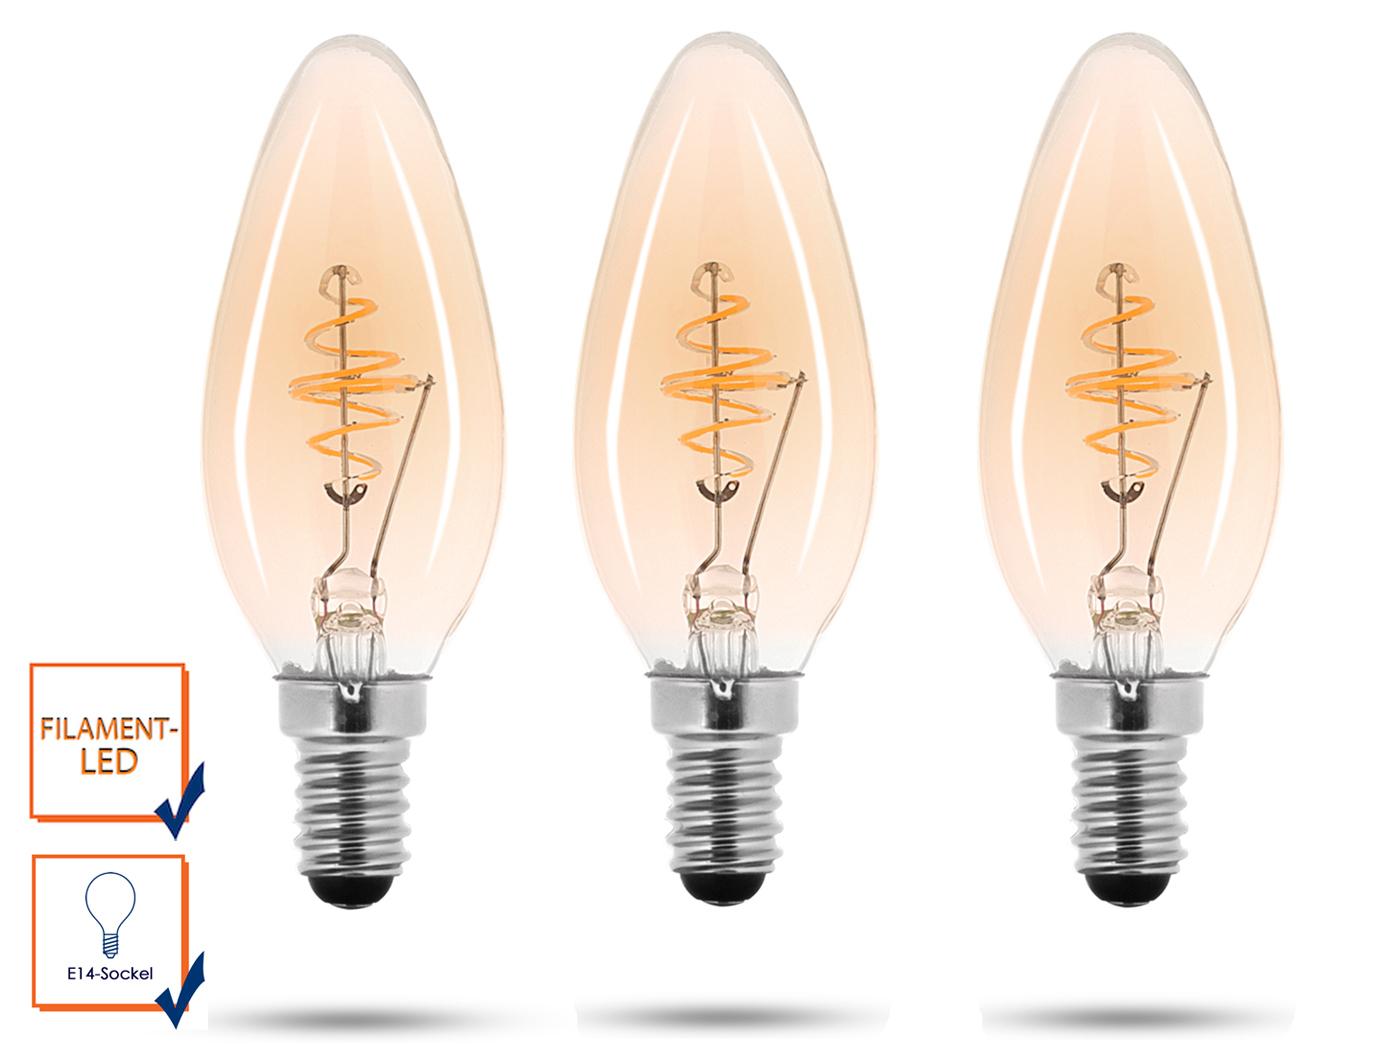 3 LED Lampe, 3 Watt, 150 Lumen, 2000 Kelvin, E14-Sockel ...